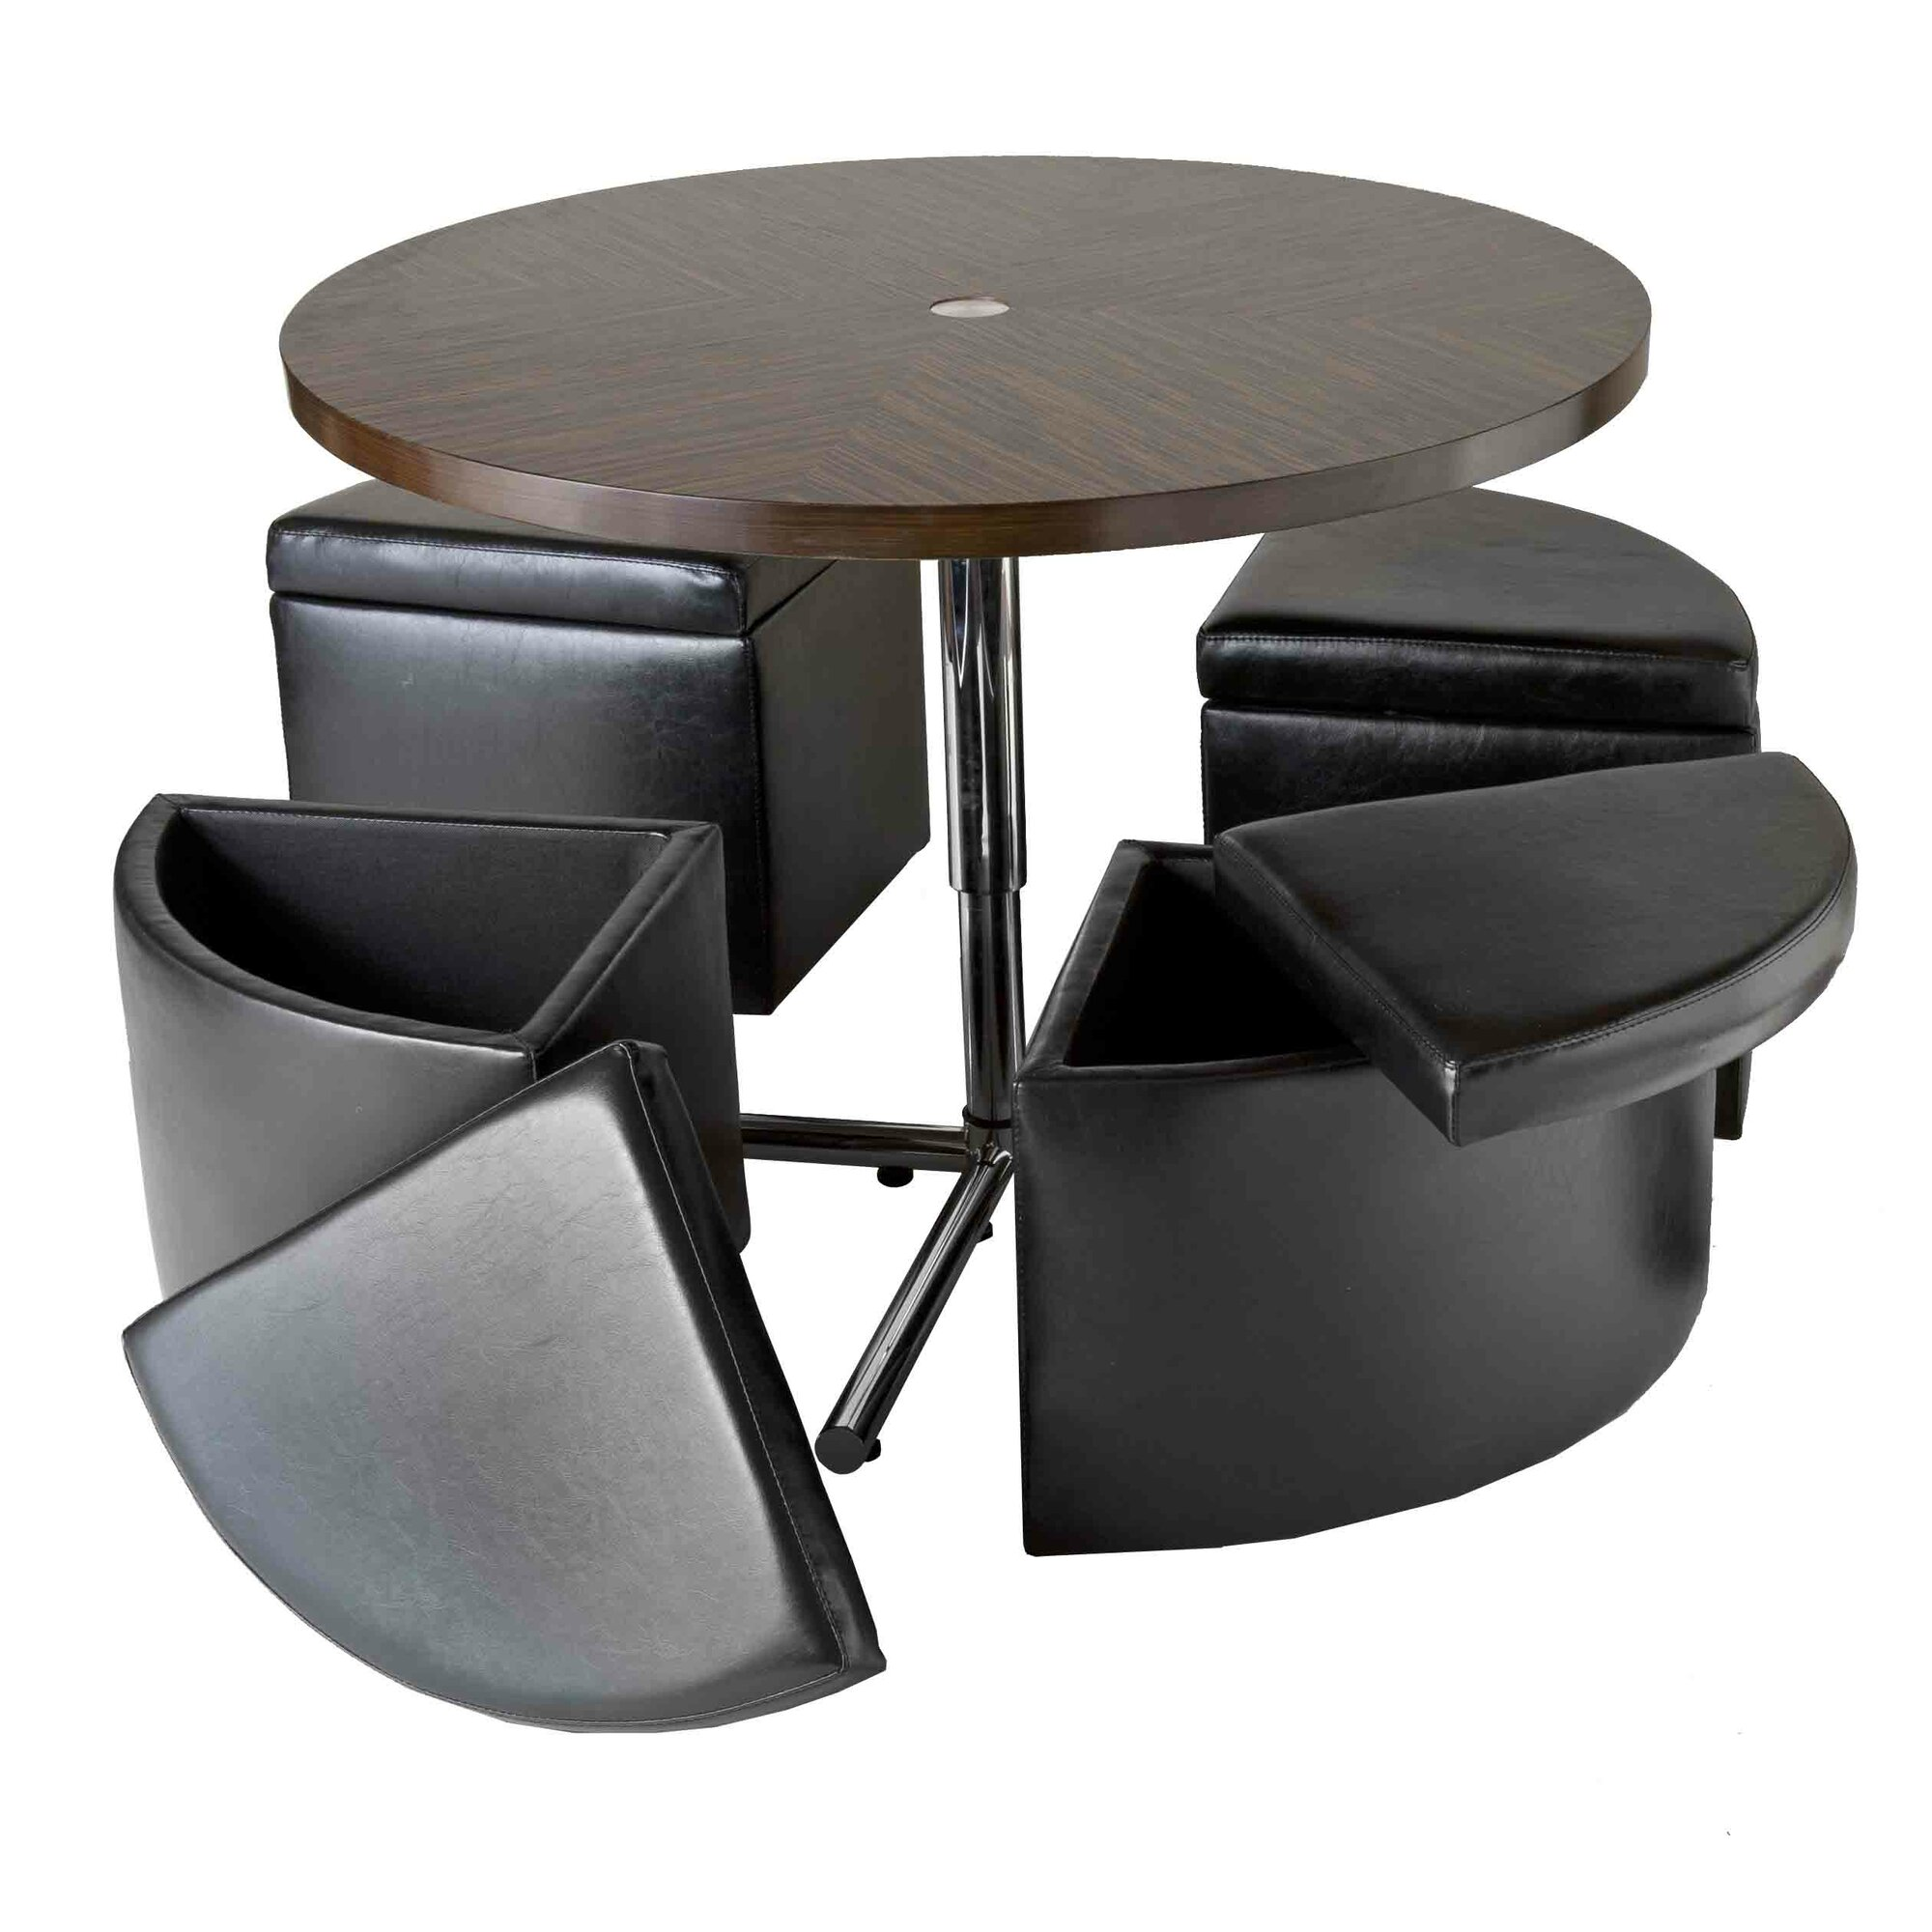 Bernhardt Park West Coffee Table Rascalartsnyc